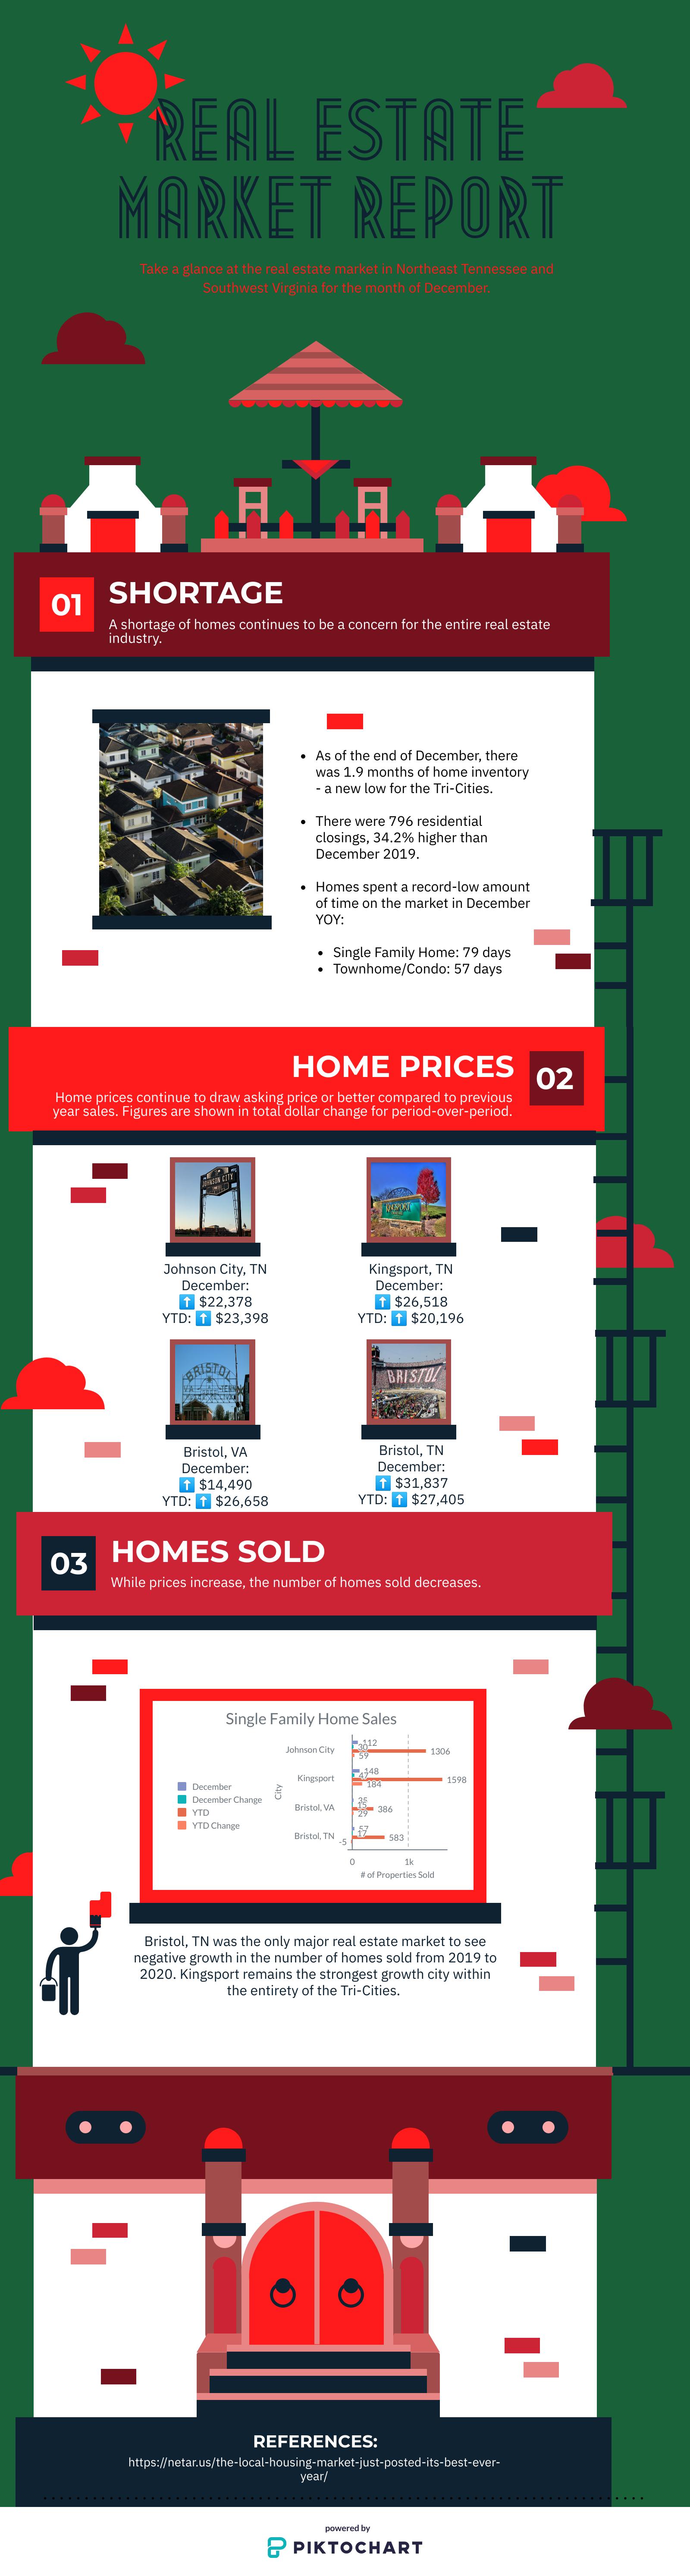 infographic, real estate market, tri cities, kingsport, johnson city, bristol, red door agency, market update